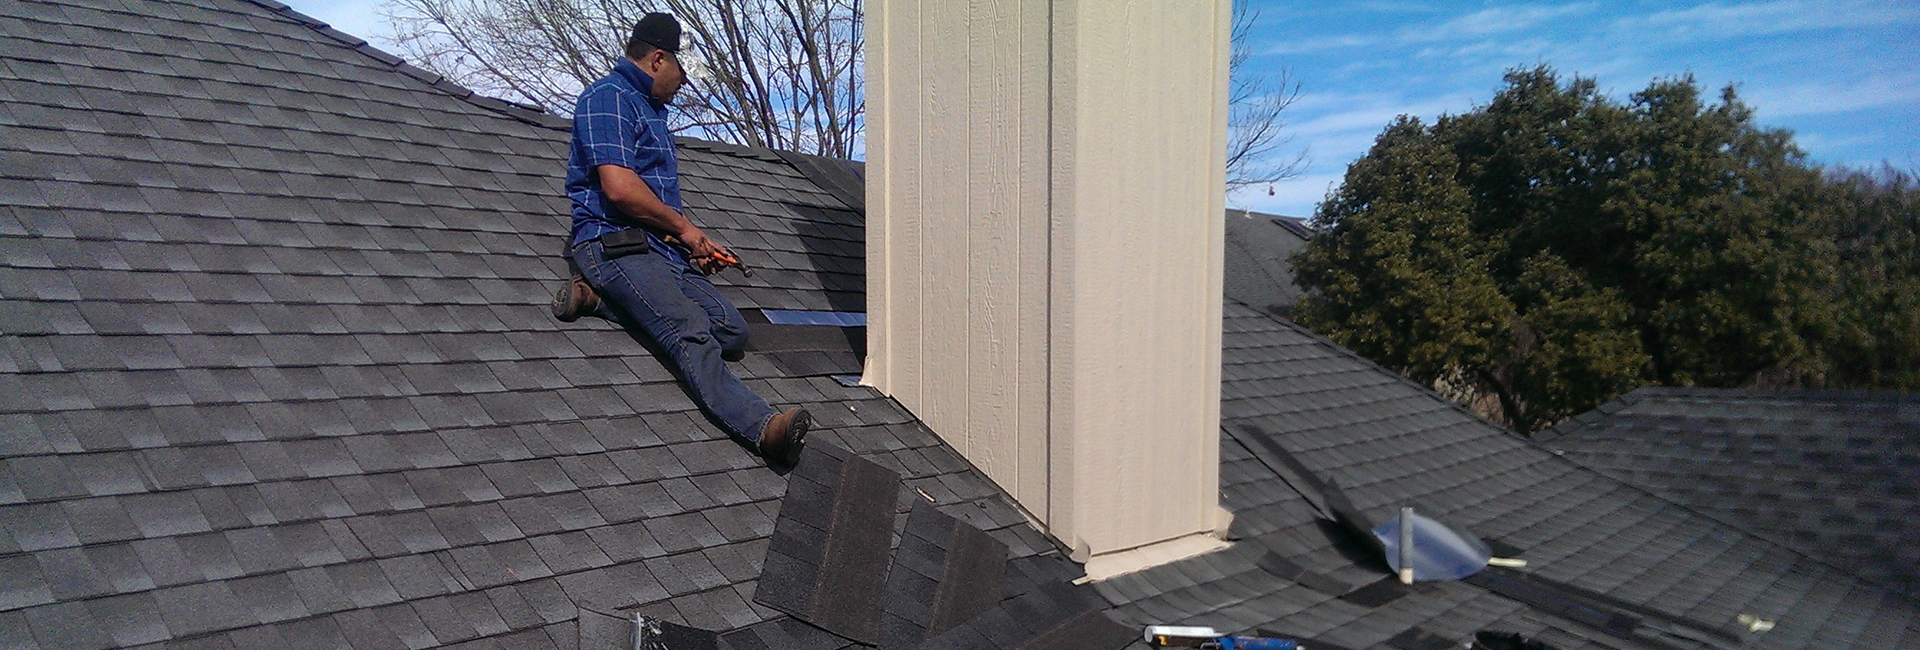 Roof Repair In Wylie Dallas Richardson Allen Plano